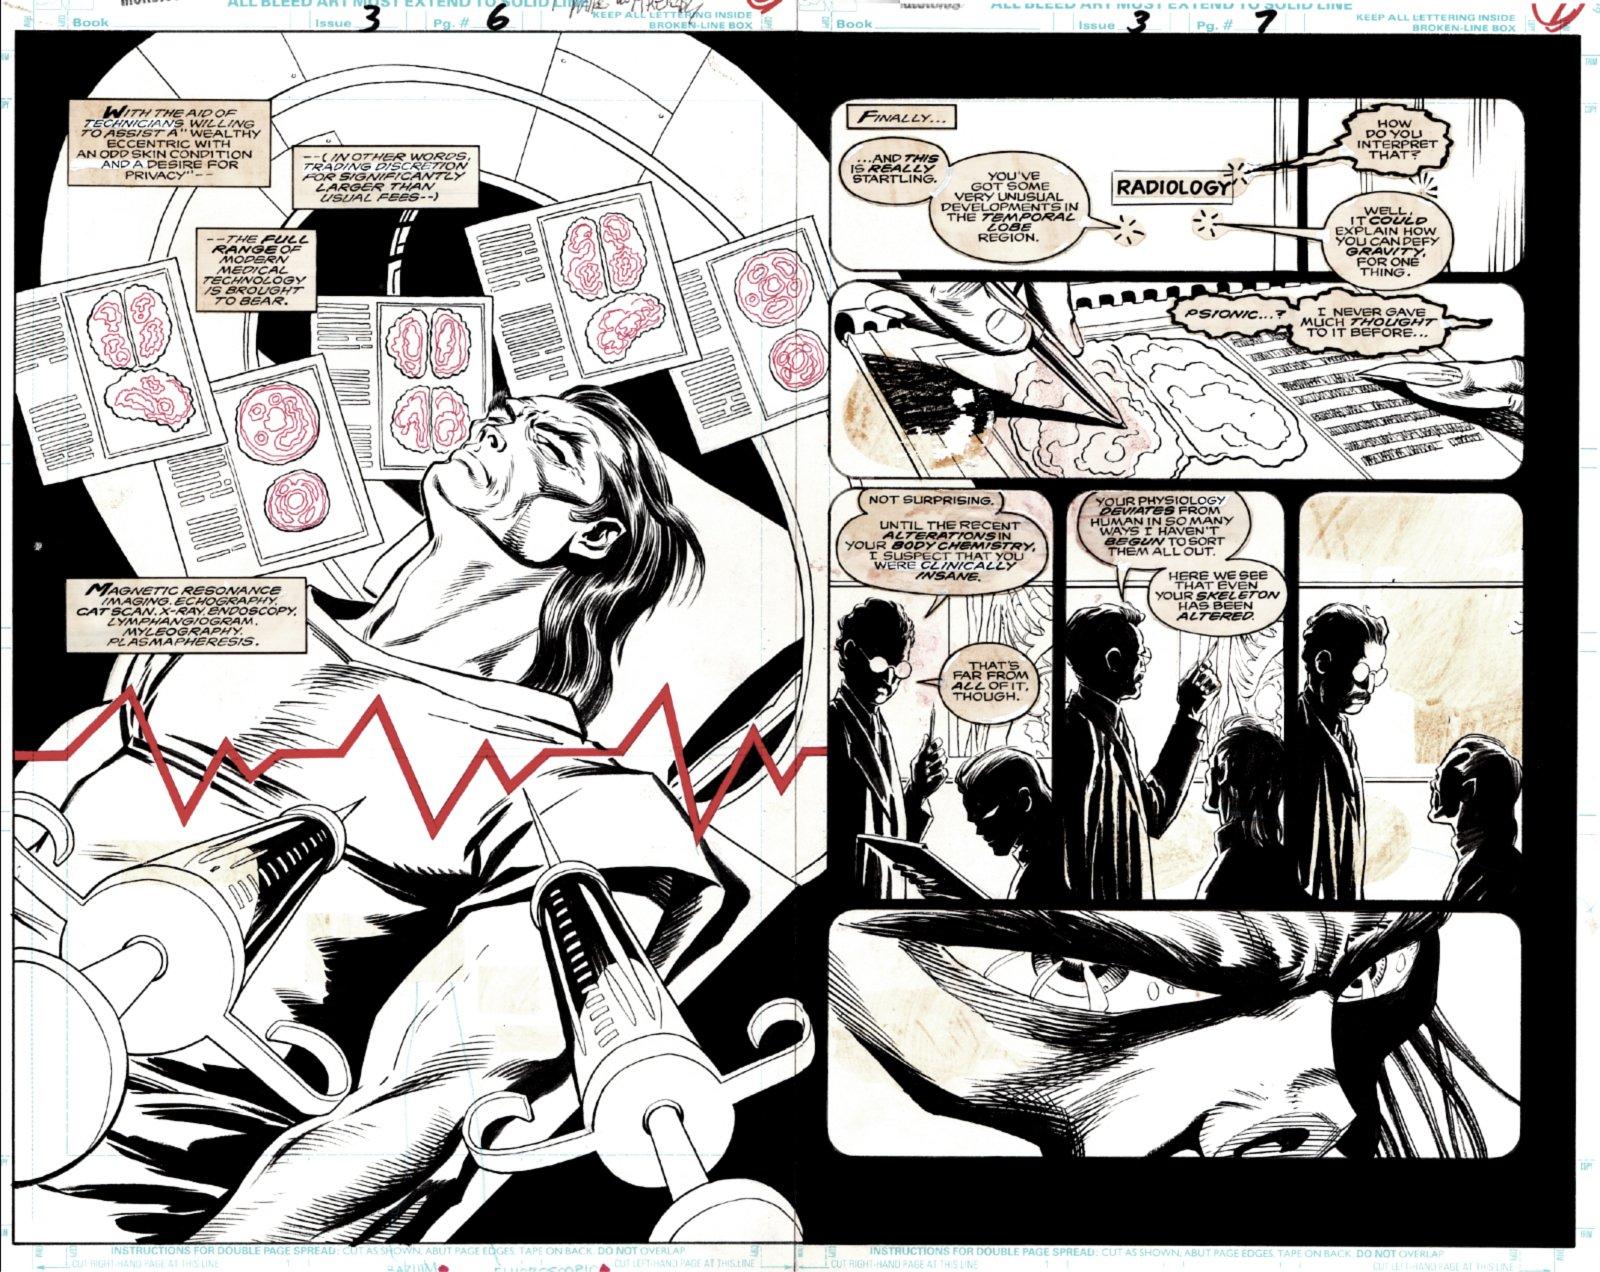 Morbius: The Living Vampire #3 p 6-7 Double Spread Splash (1992)